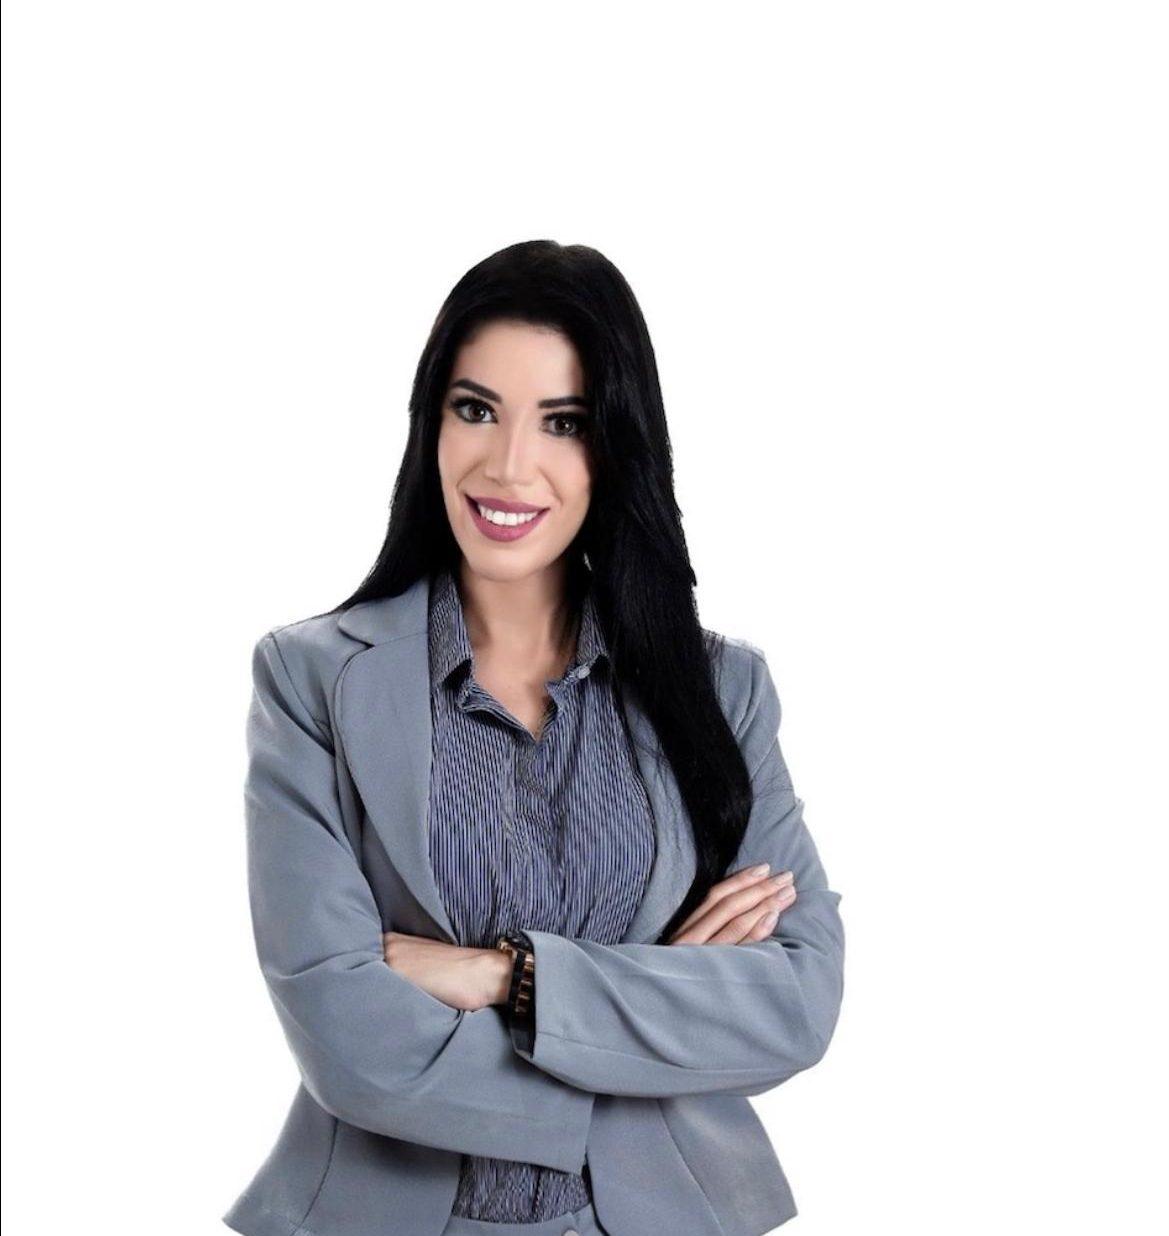 Gabriela Vivere